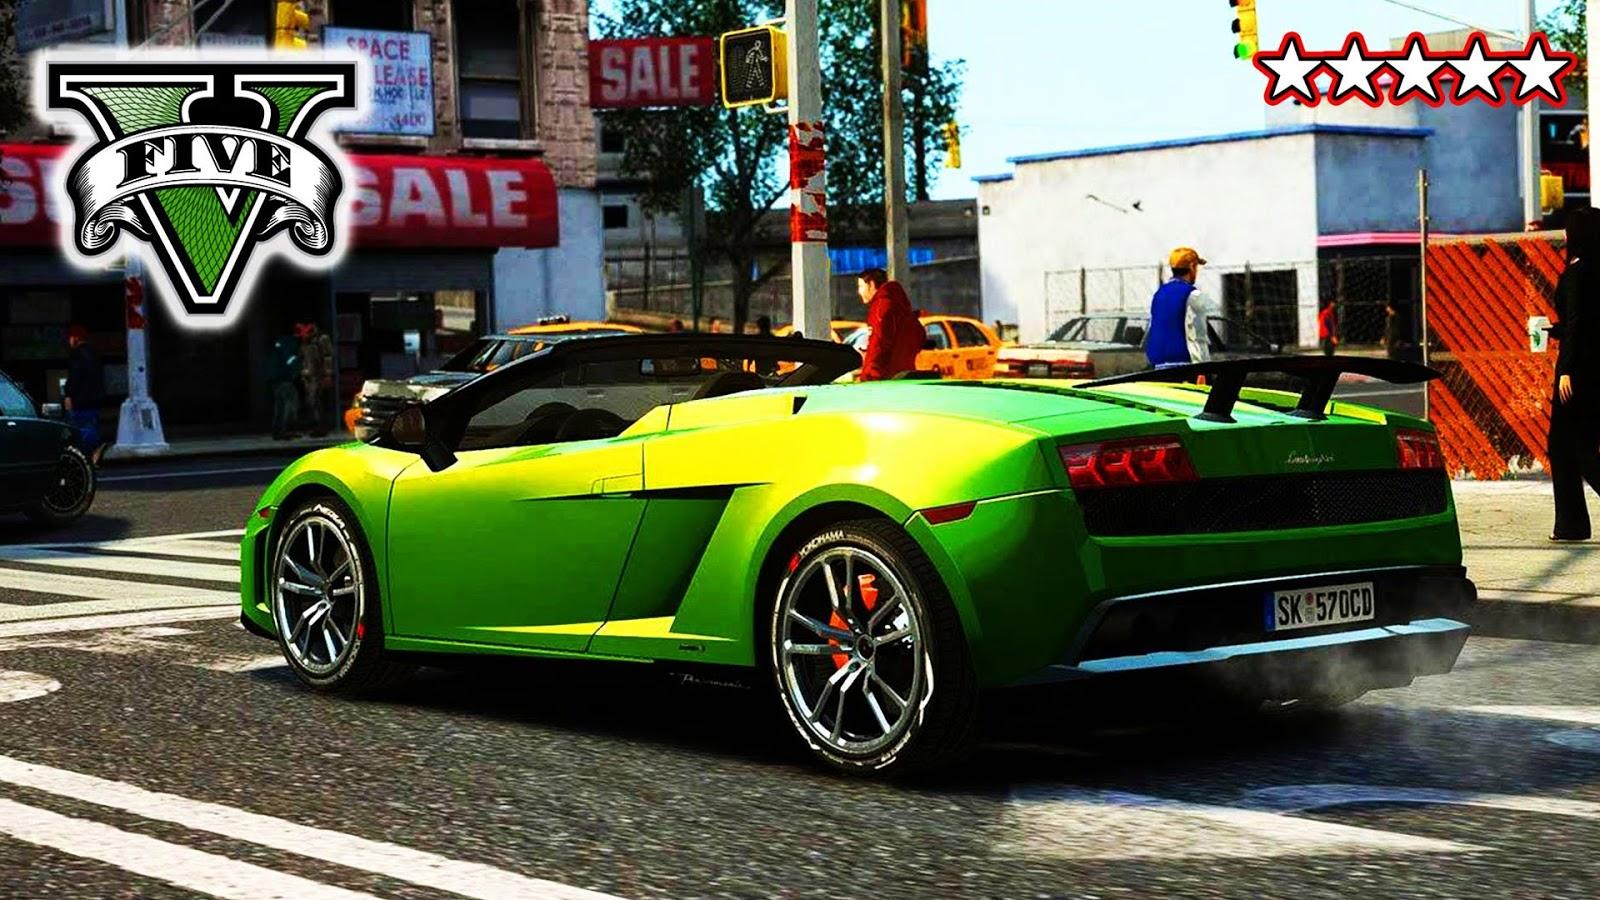 grand theft auto 5 car s hd 1080p 1920x1080 desktop 02